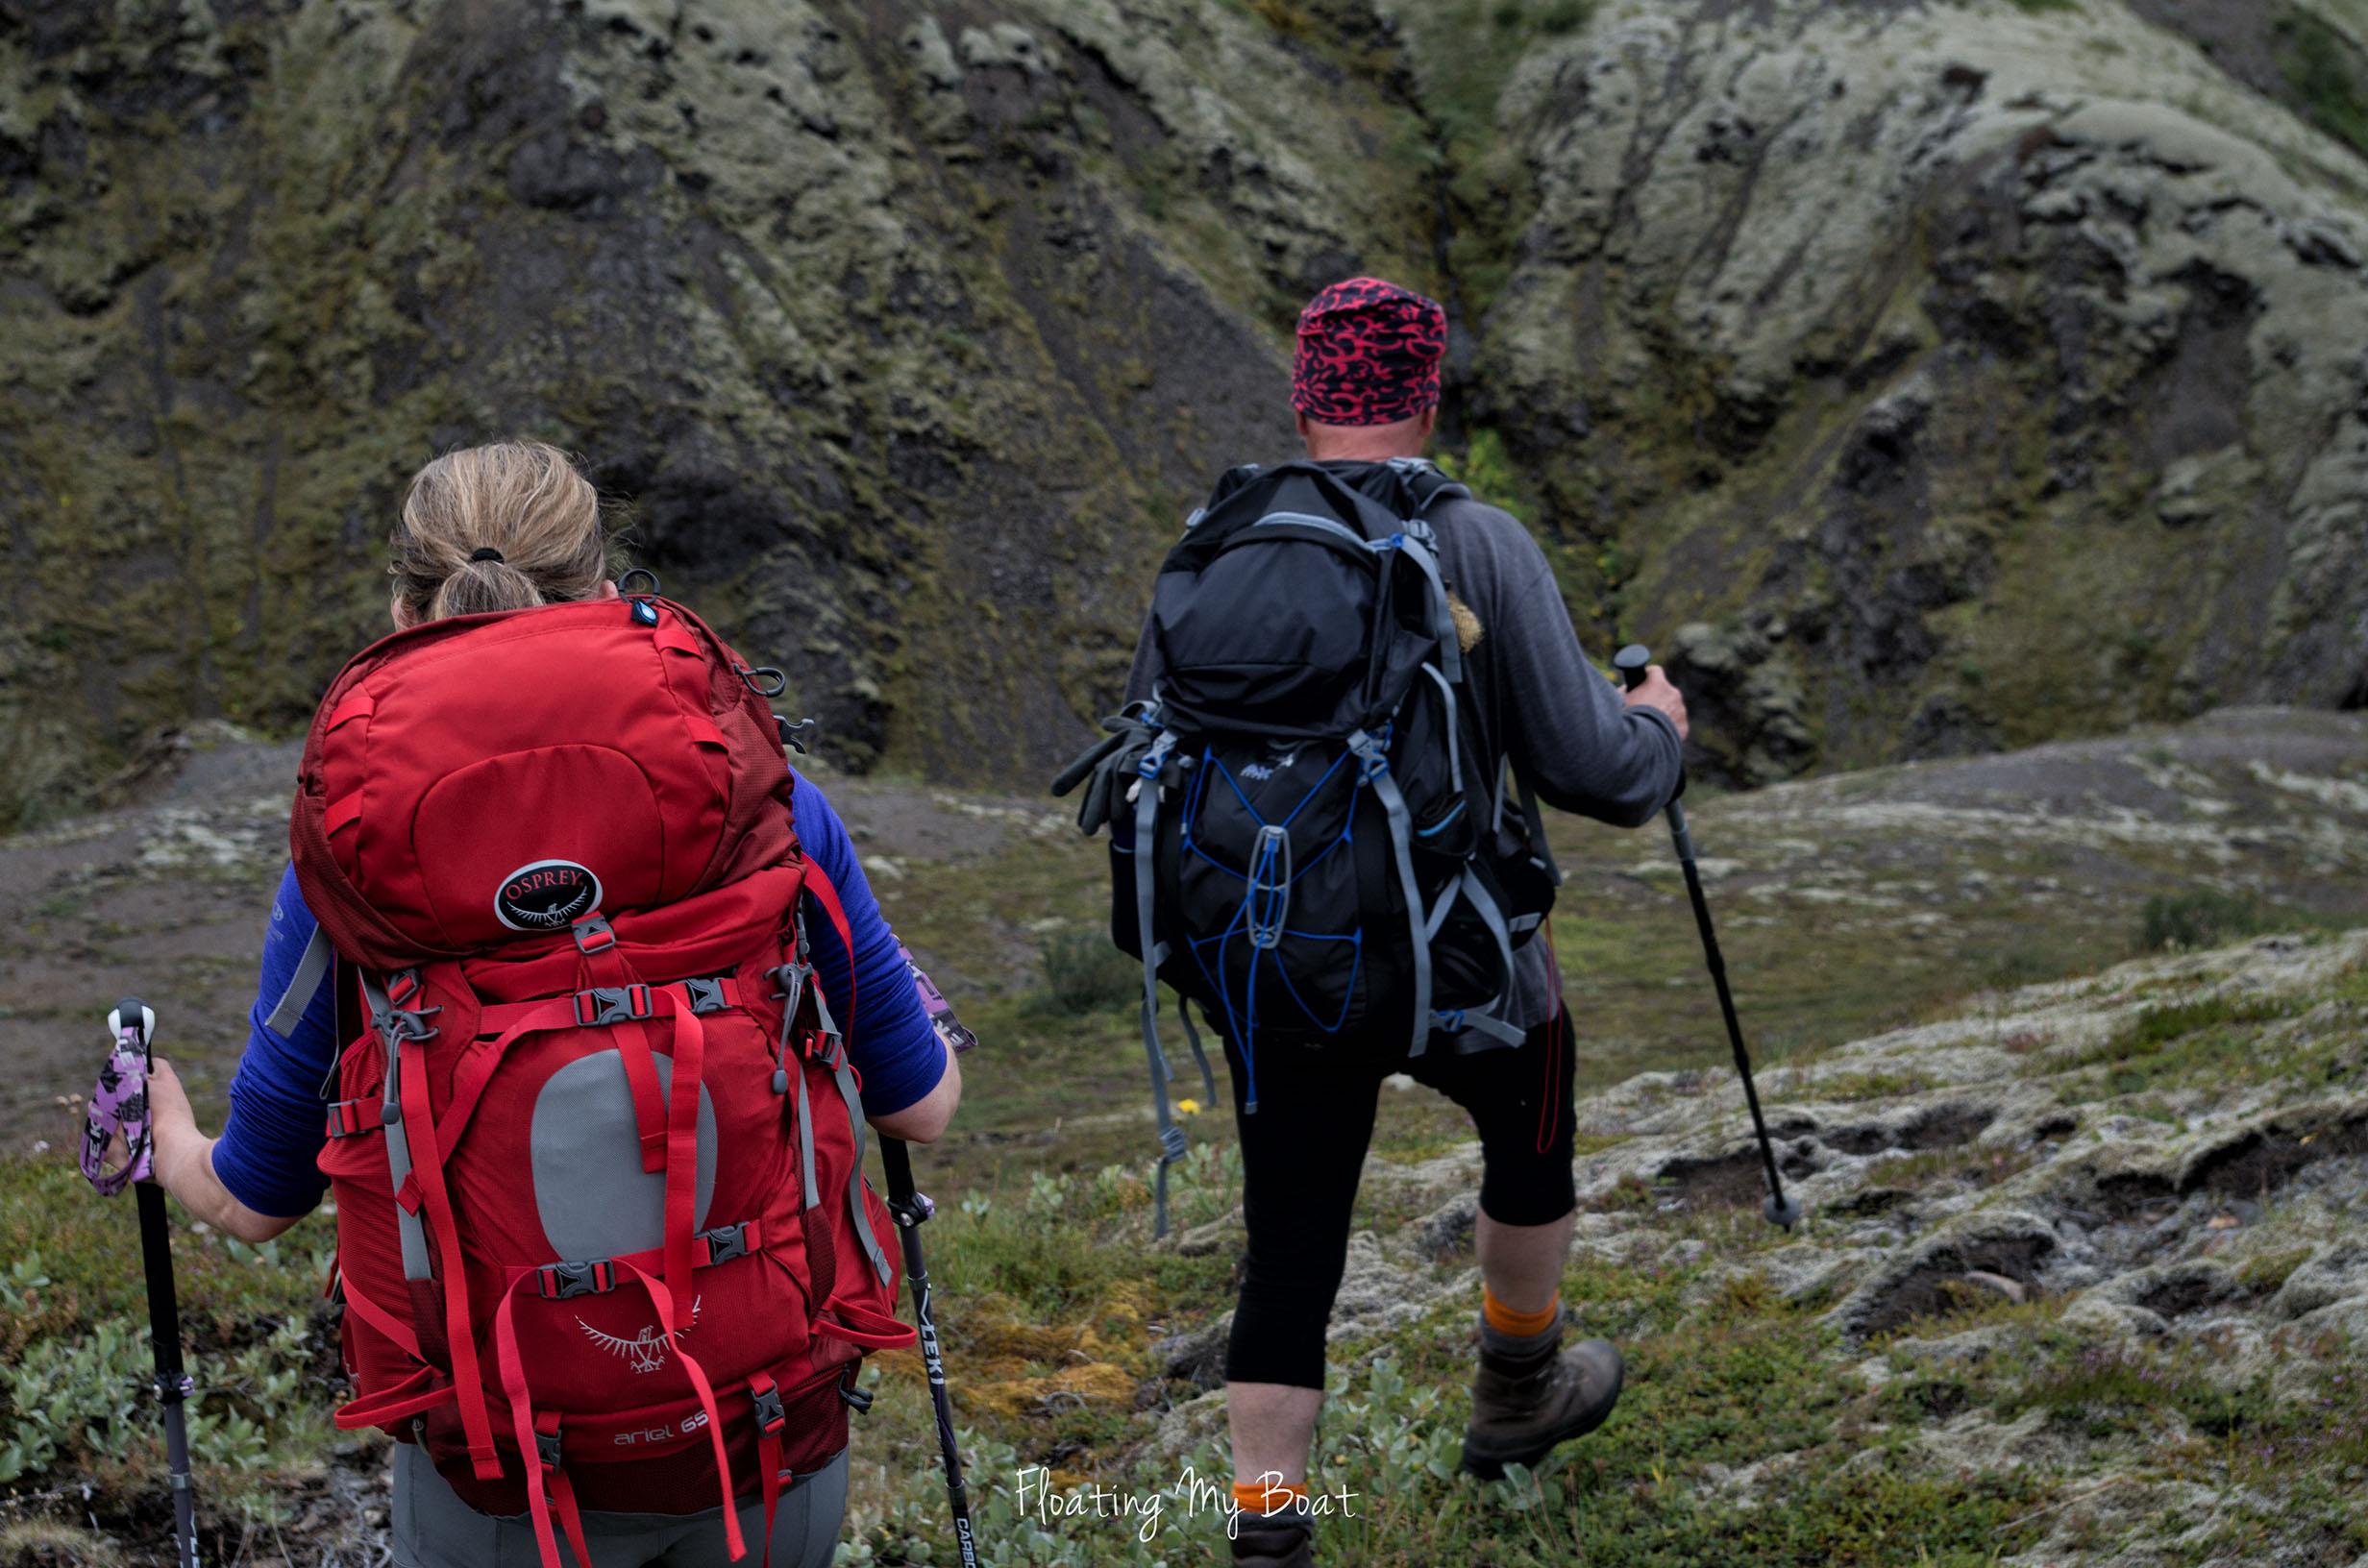 Núpsstaðaskógur-challenging-trekking-Iceland-practical-information